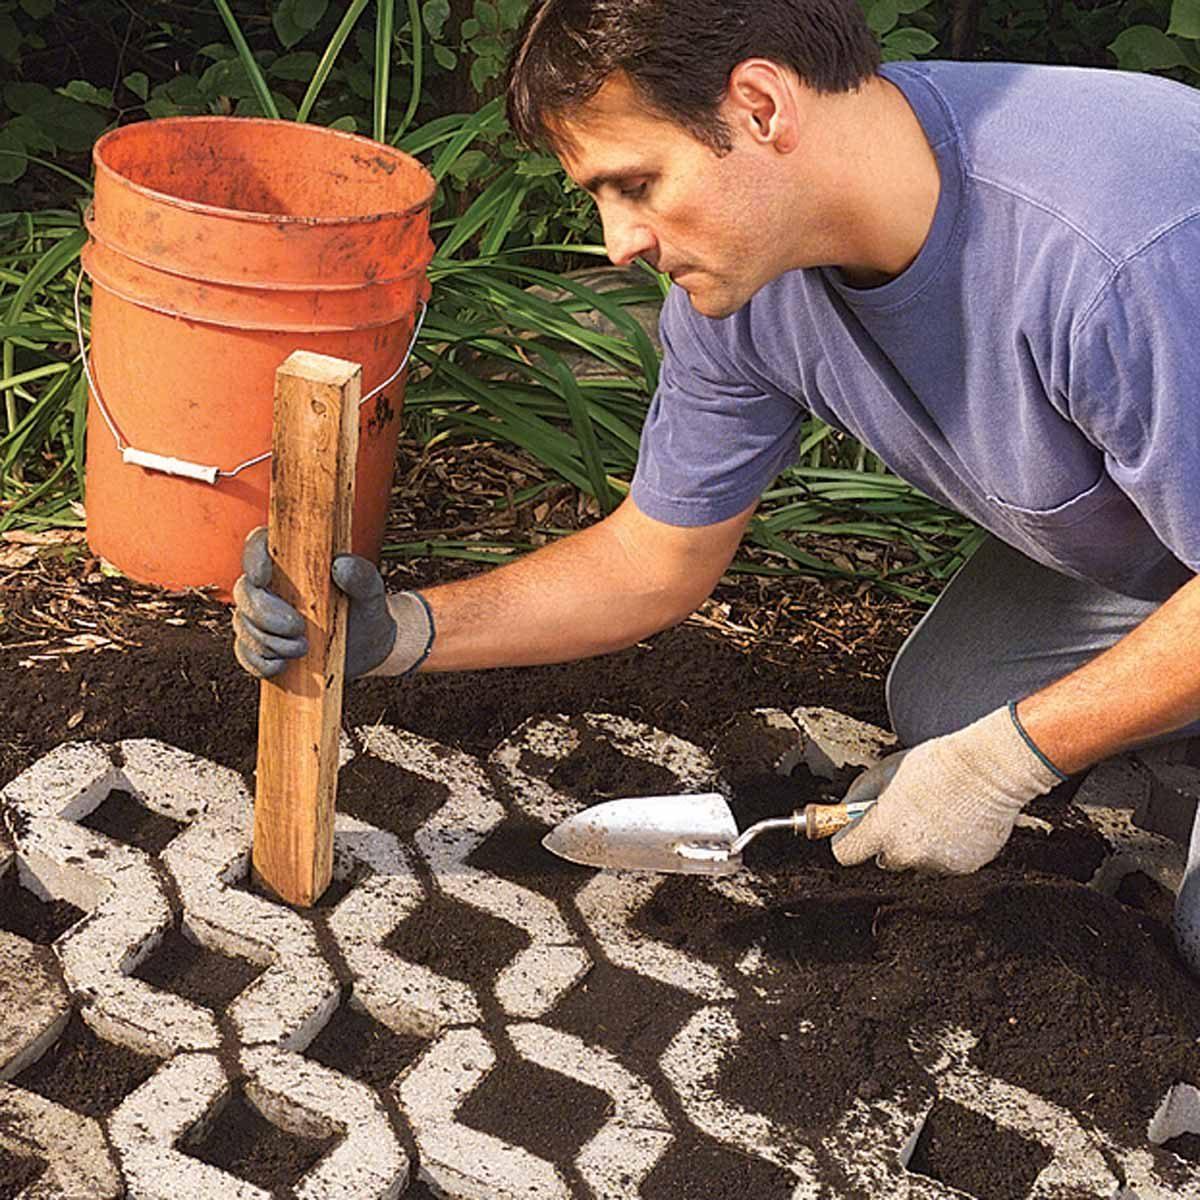 paver path that grows dirt